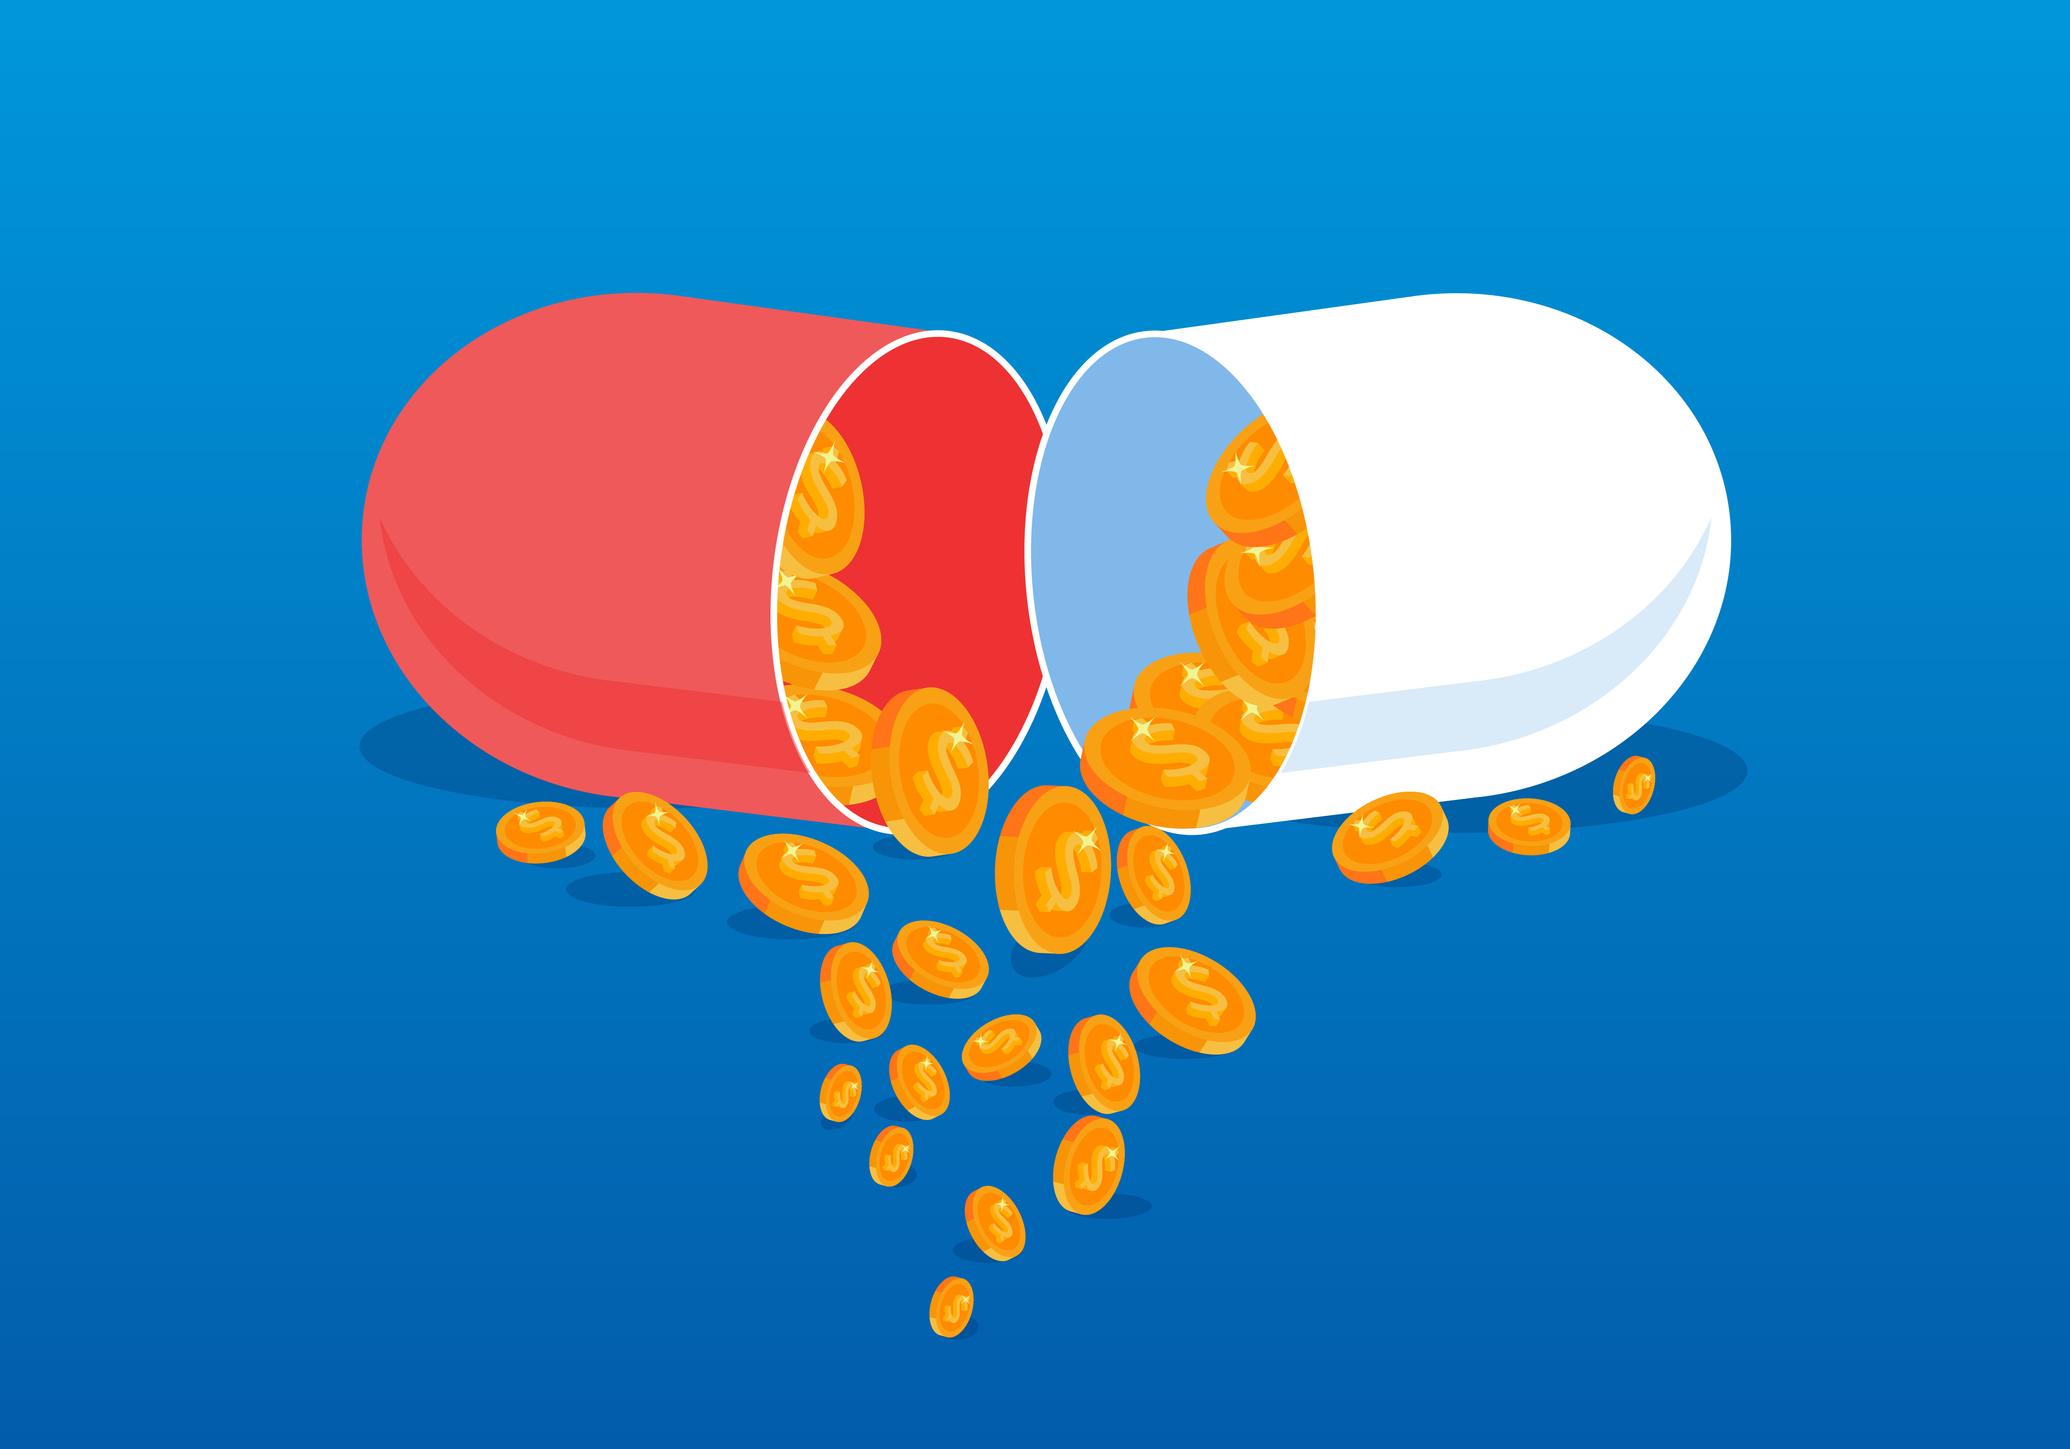 CMS Proposes To Revoke 'Most Favored Nation' Drug Pricing Model